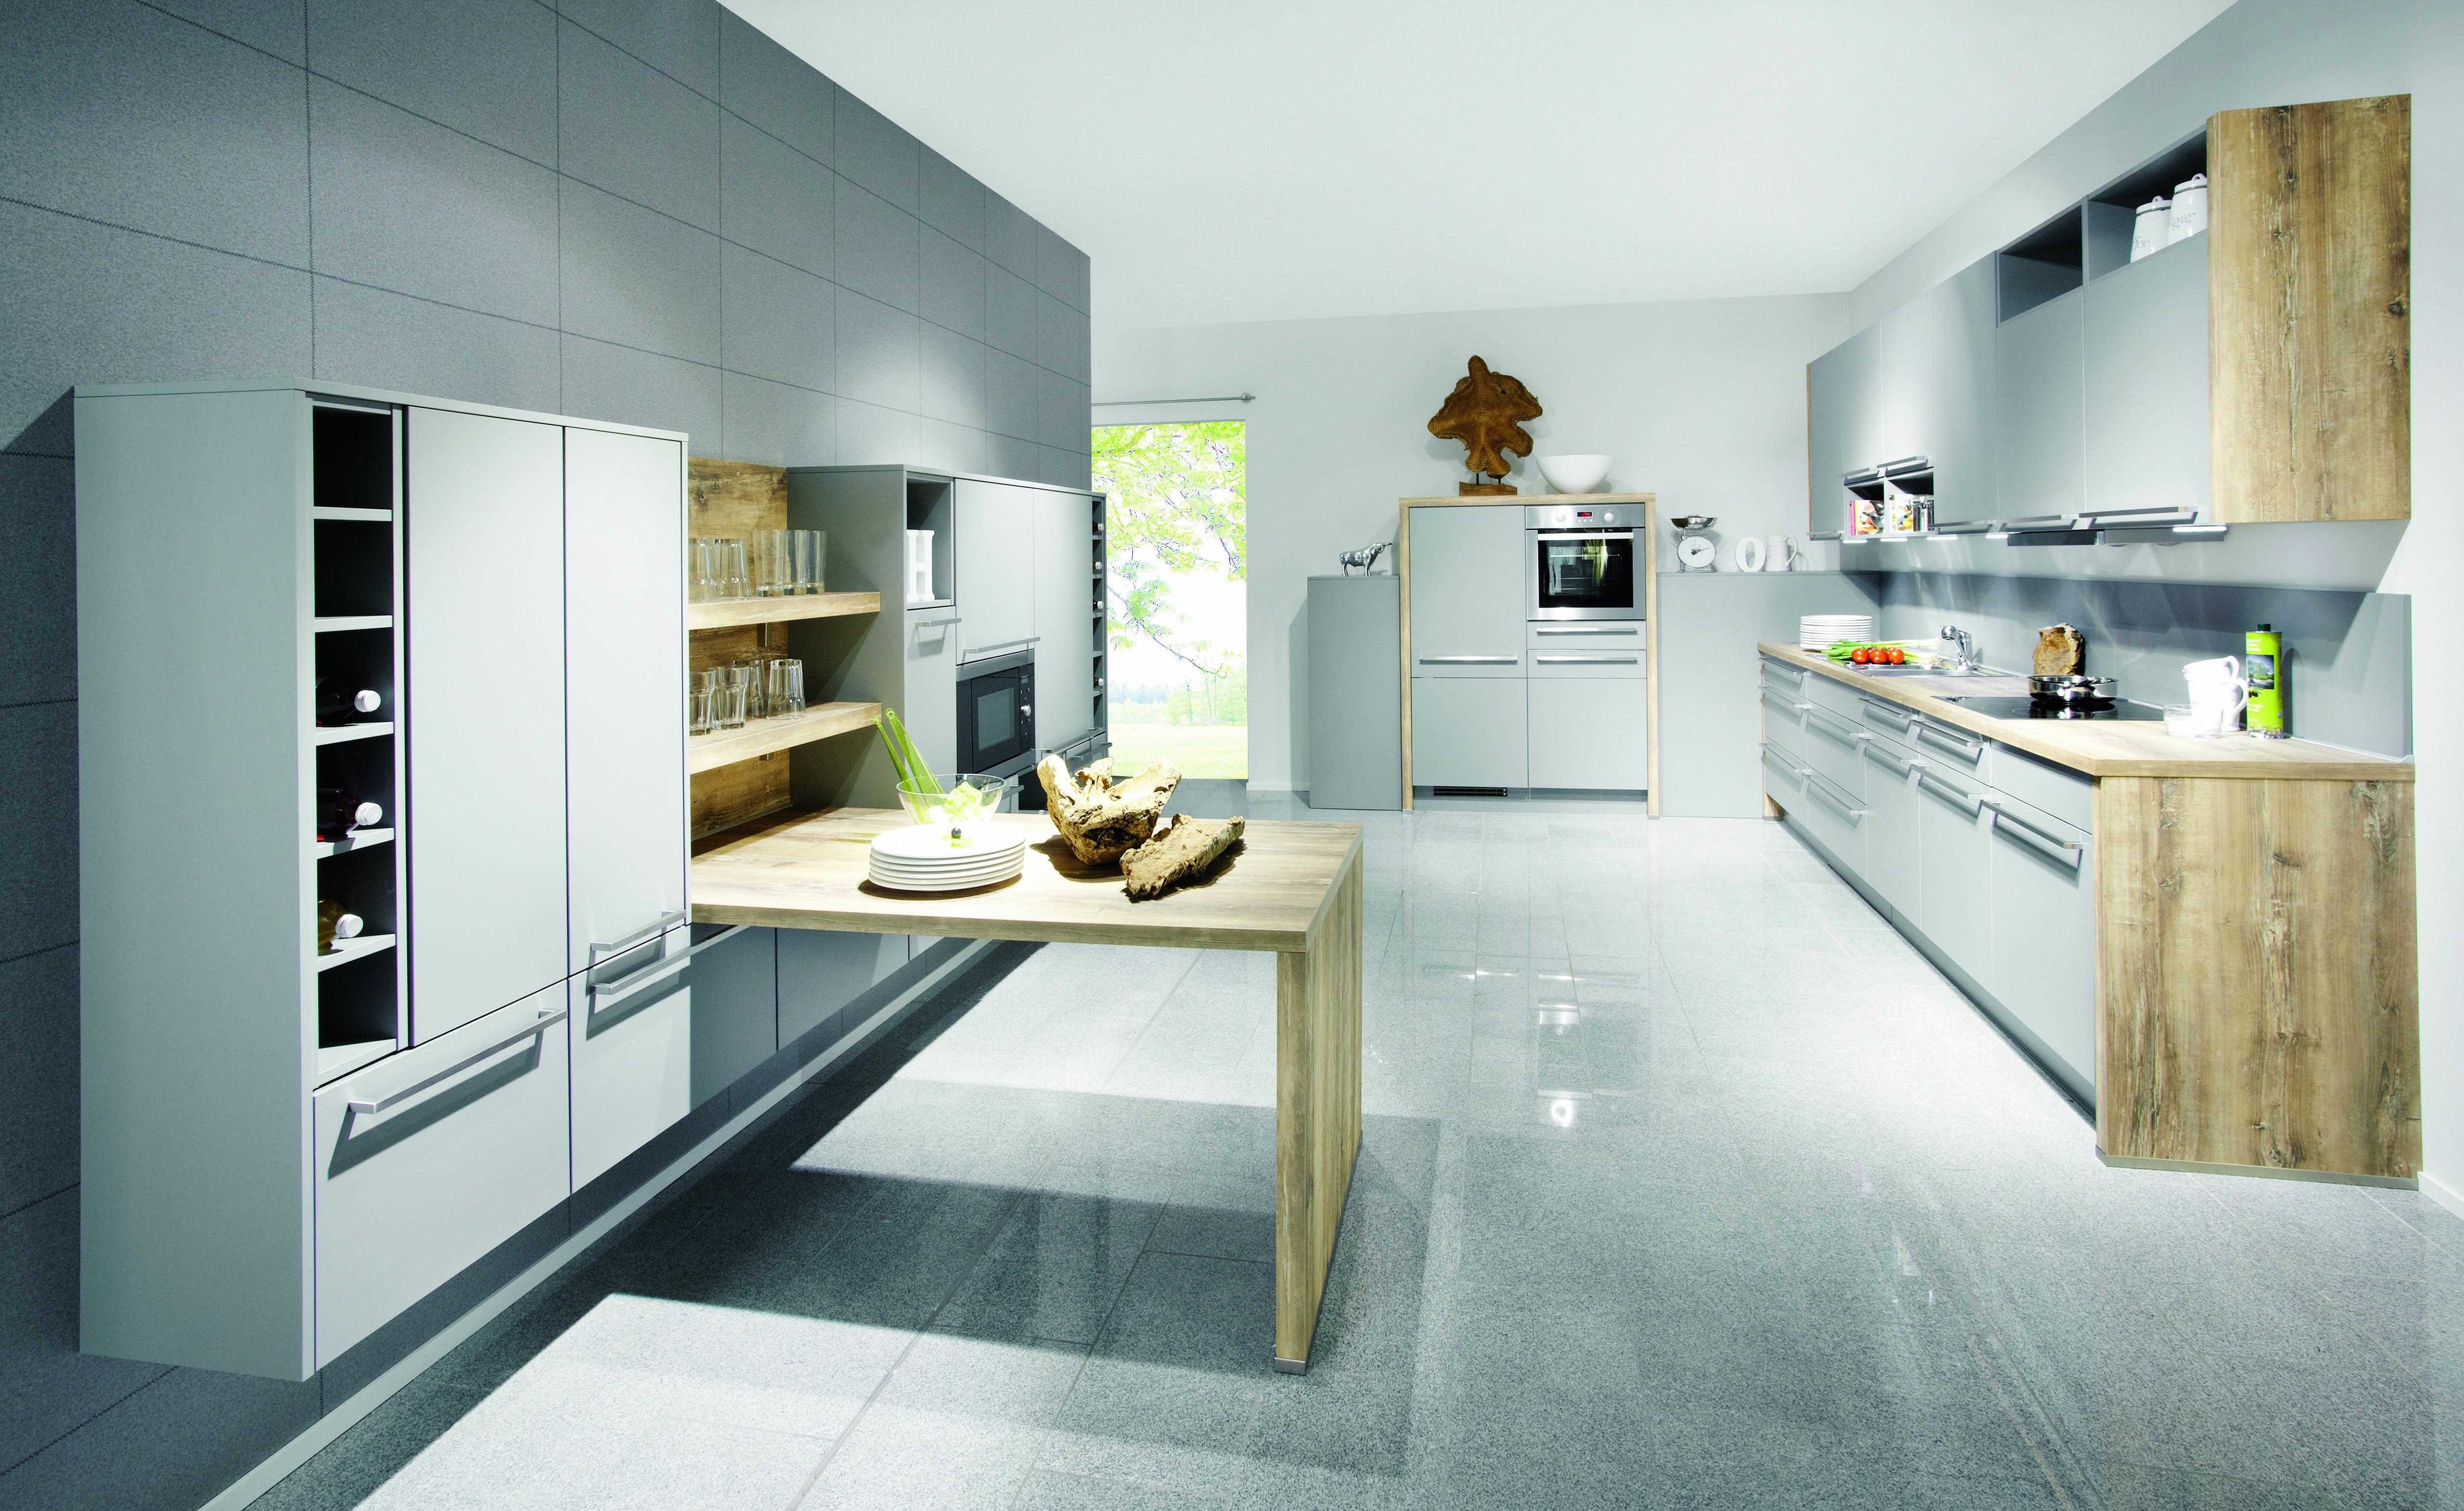 Innova Küchen Berlin groß innova küchen berlin ideen schlafzimmer ideen losviajes info